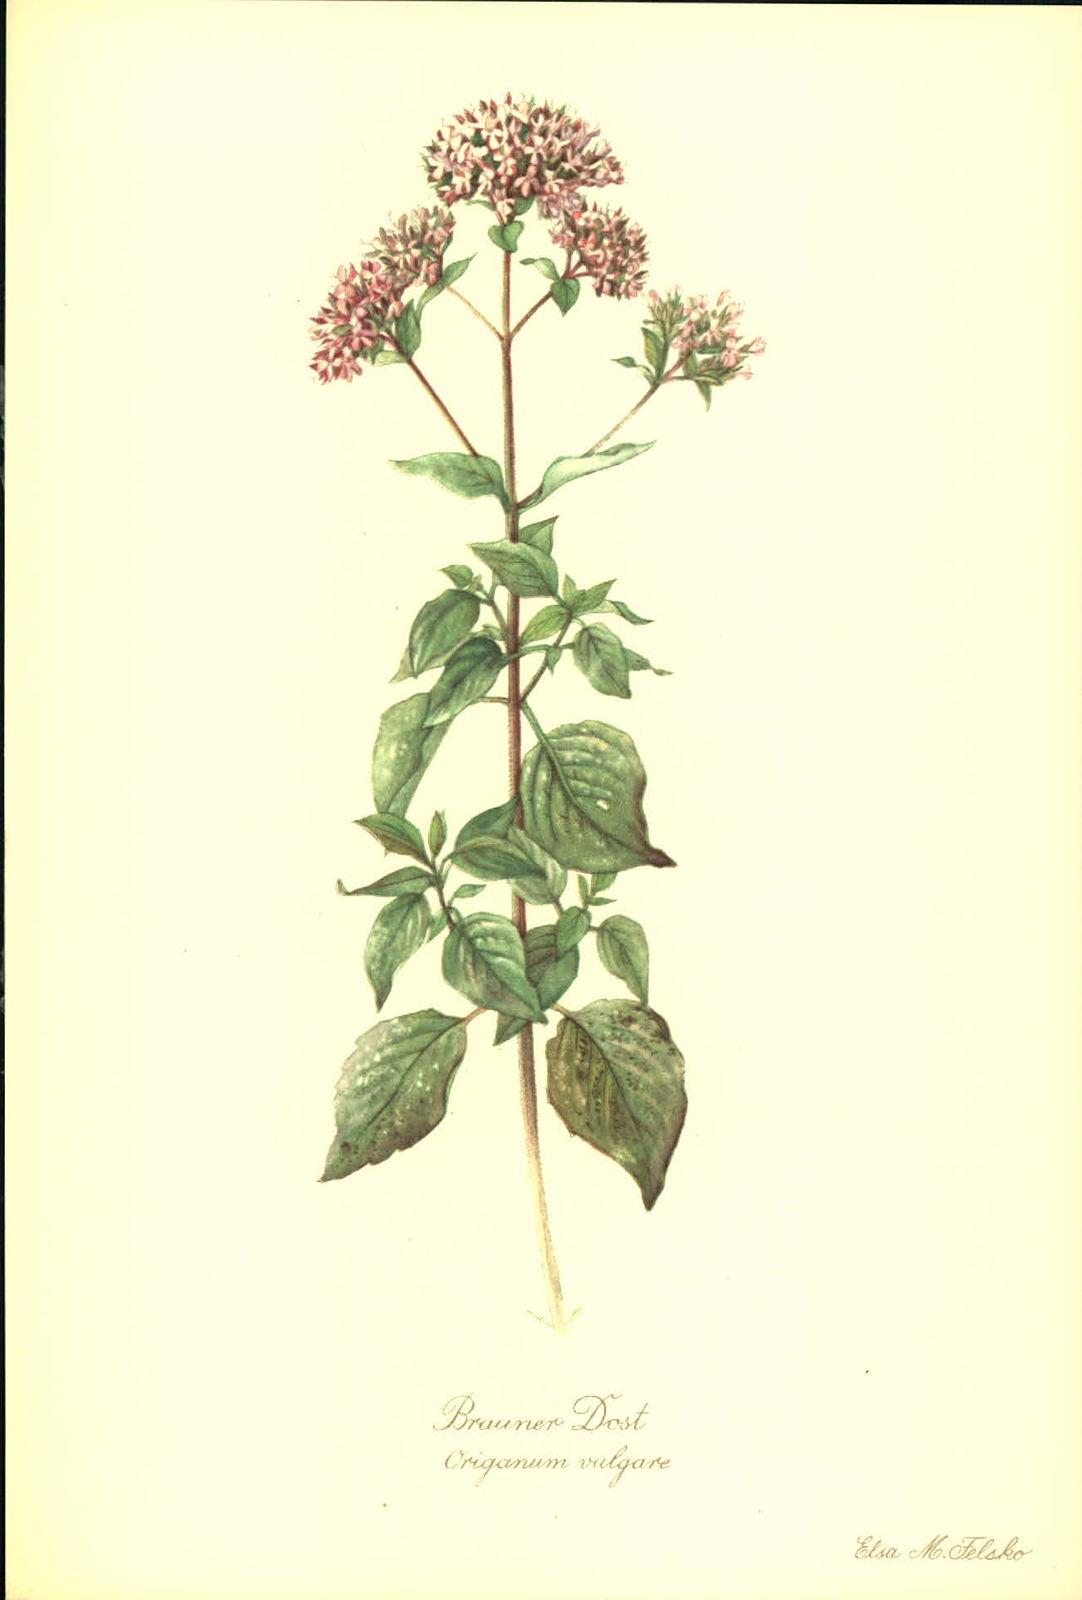 Brauner Dost (Origanum vulgare). Kunstdruck nach Aquarell von Elsa M. Felsko.